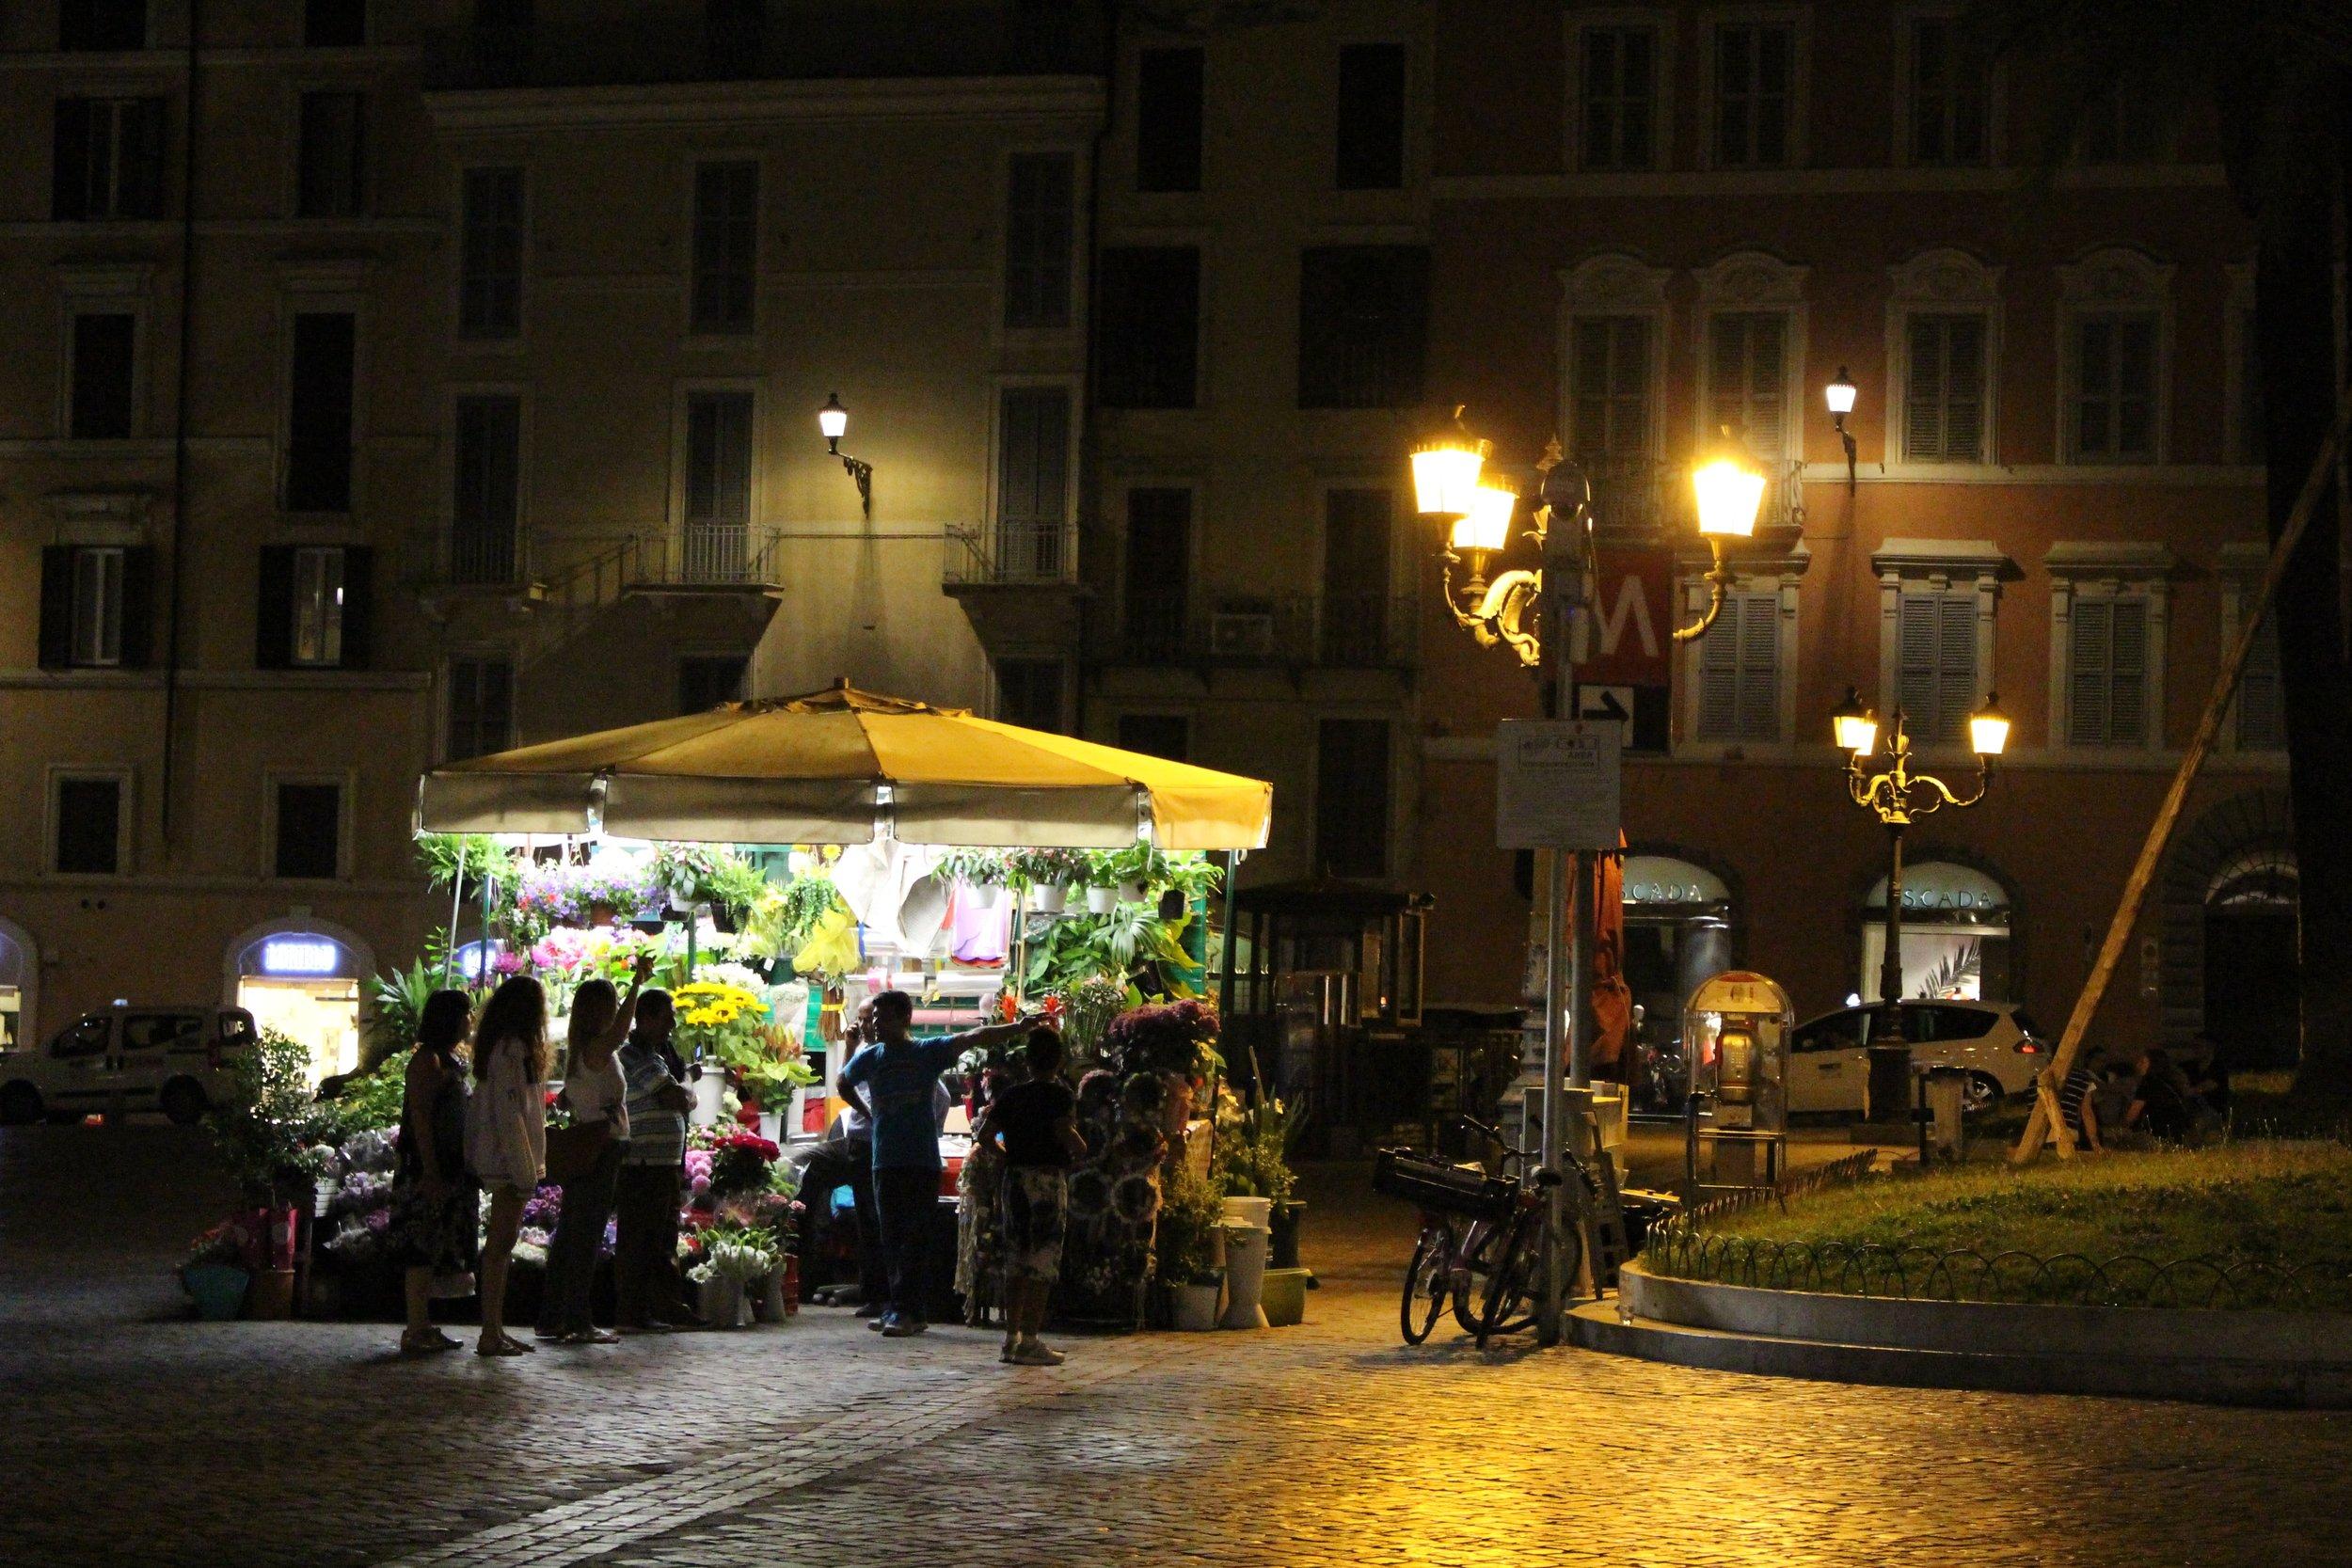 Night scenes from Rome, Italy